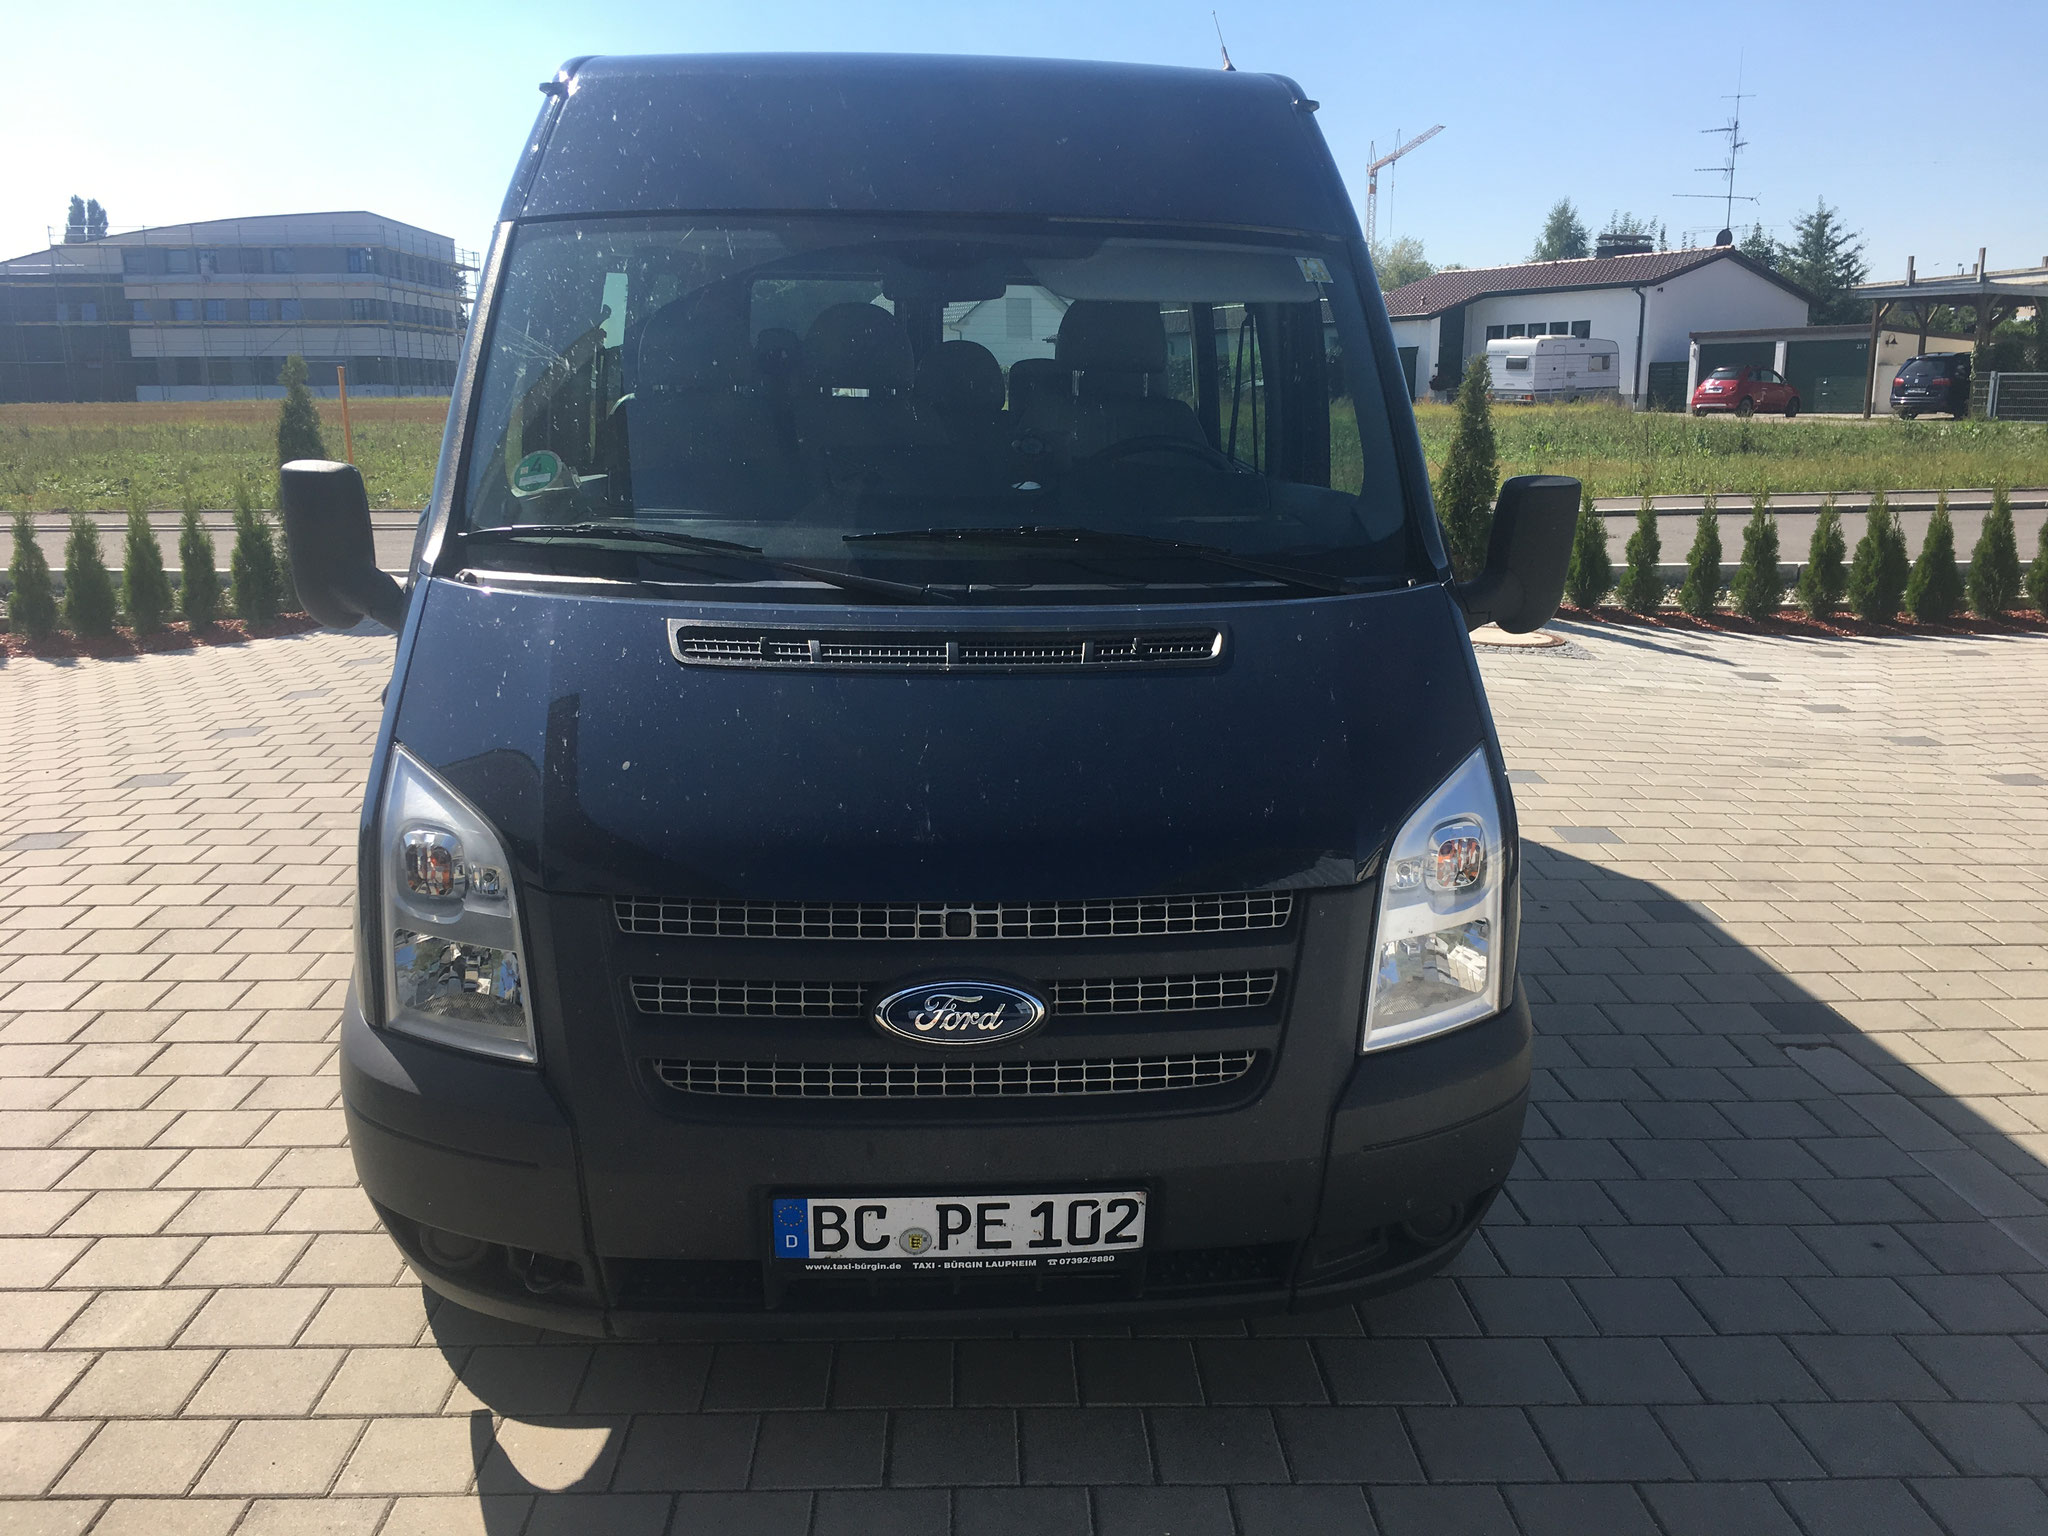 Ford Transit, wahlweise als 9-Sitzer oder ohne Bestuhlung als Transporter